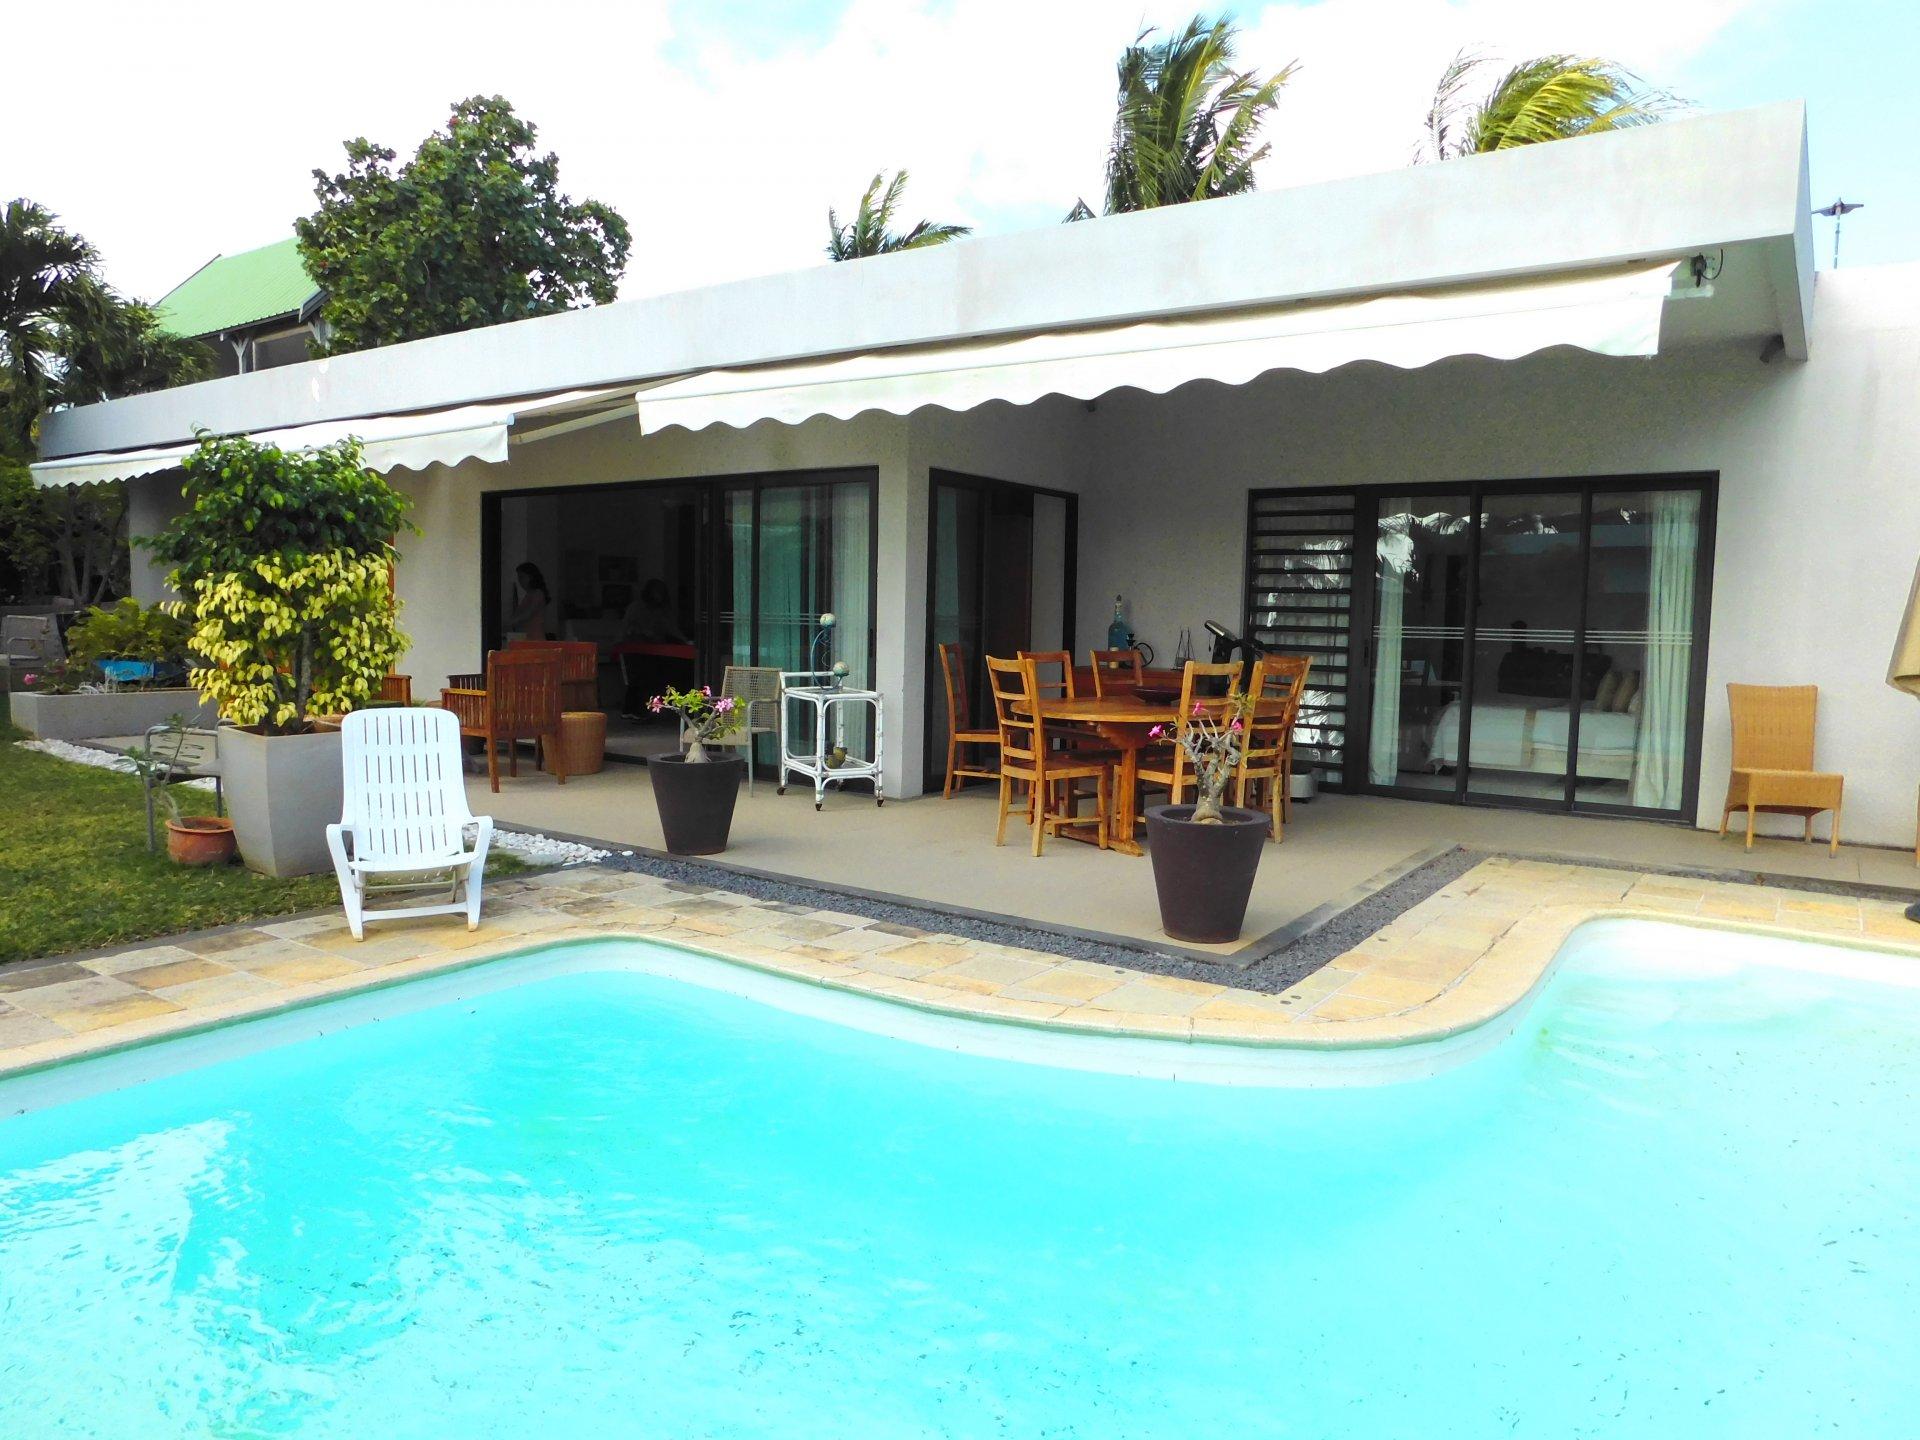 Rental House - Cap Malheureux - Mauritius